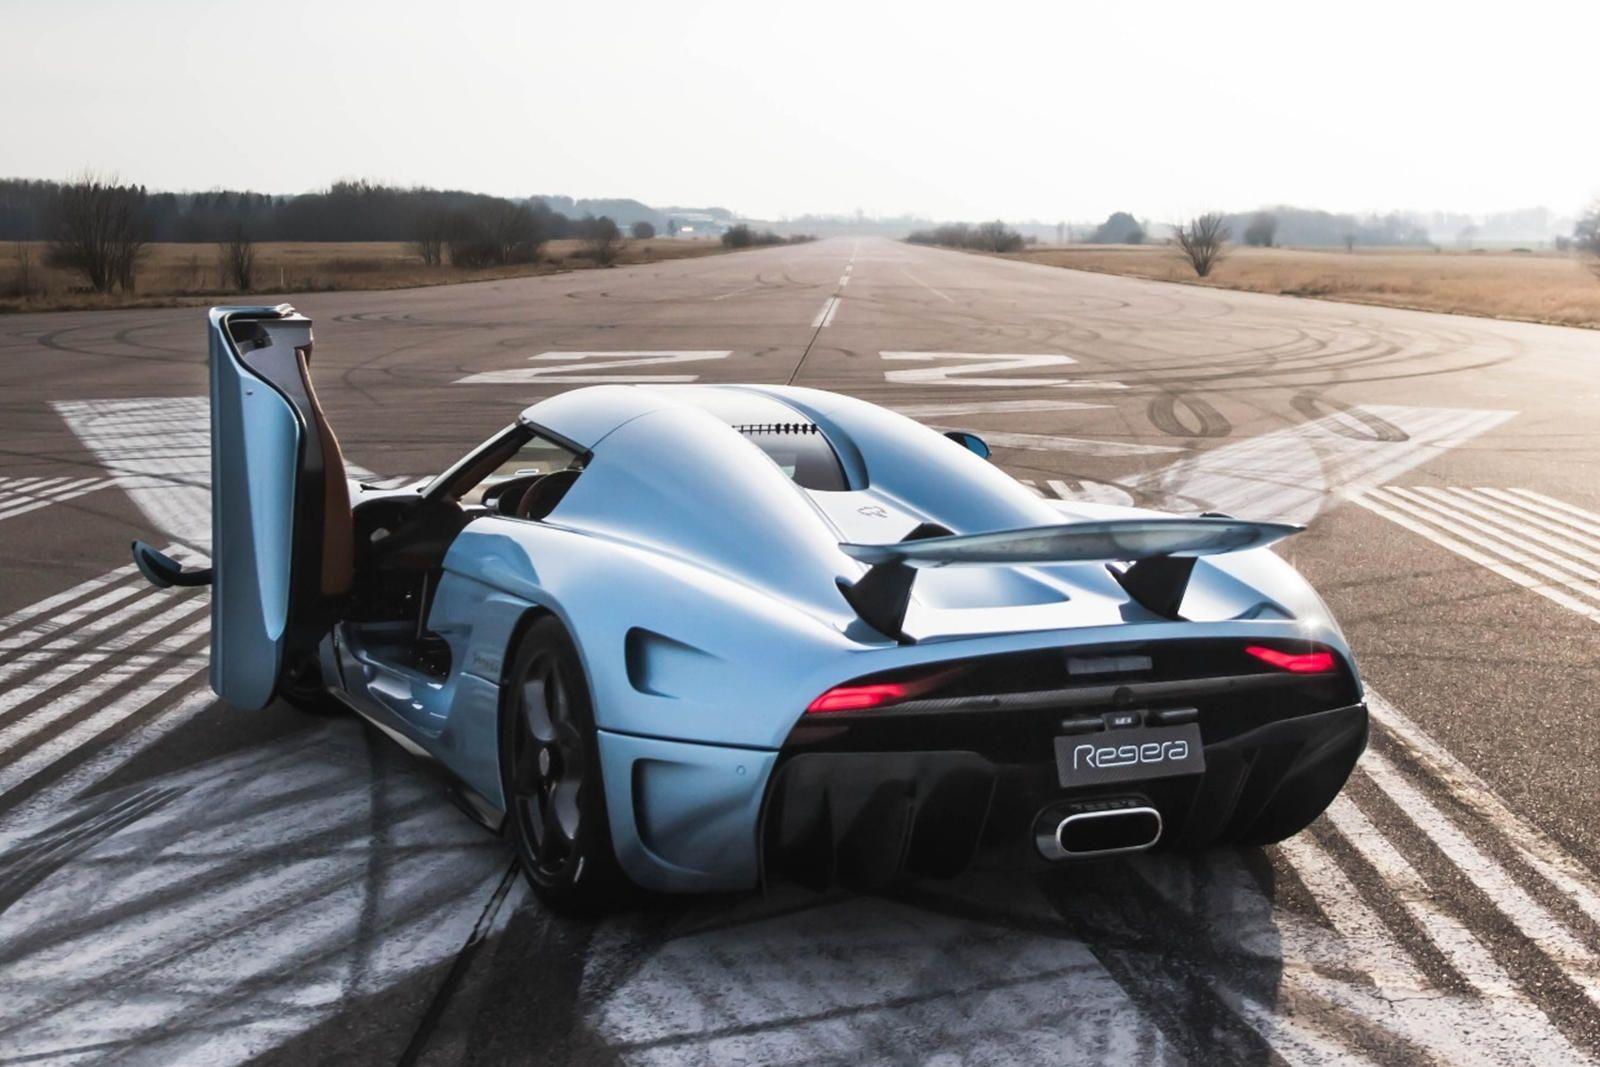 2016 Koenigsegg Regera Rear Angle View